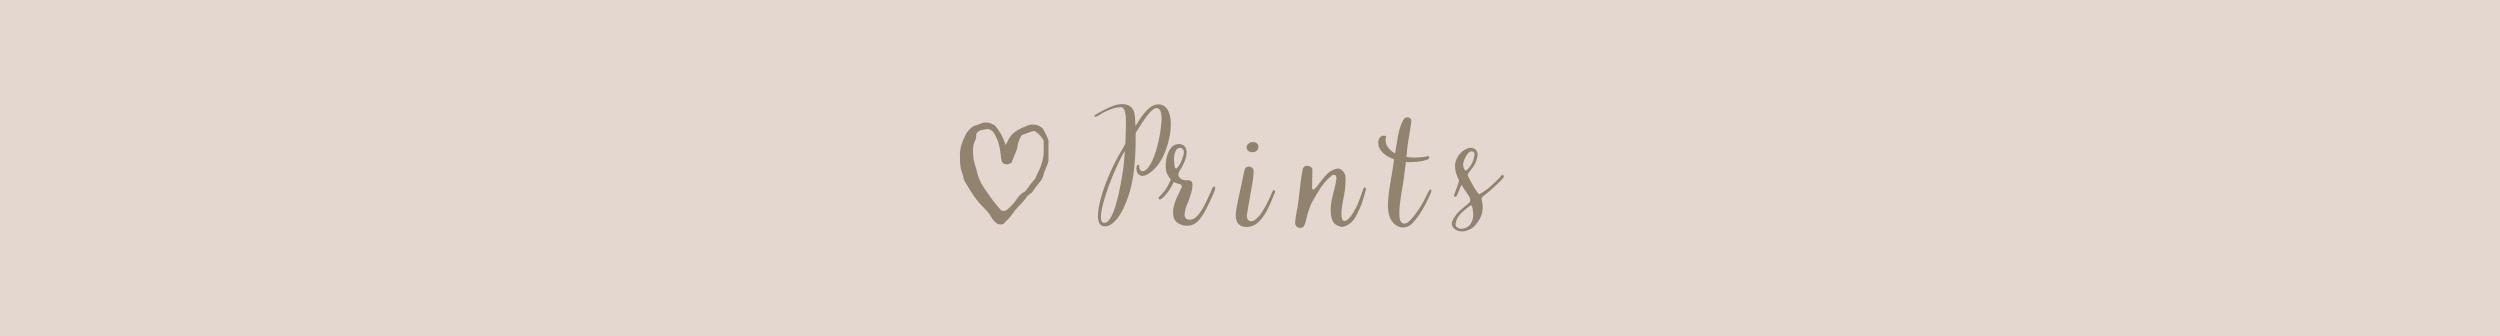 prints1.jpg